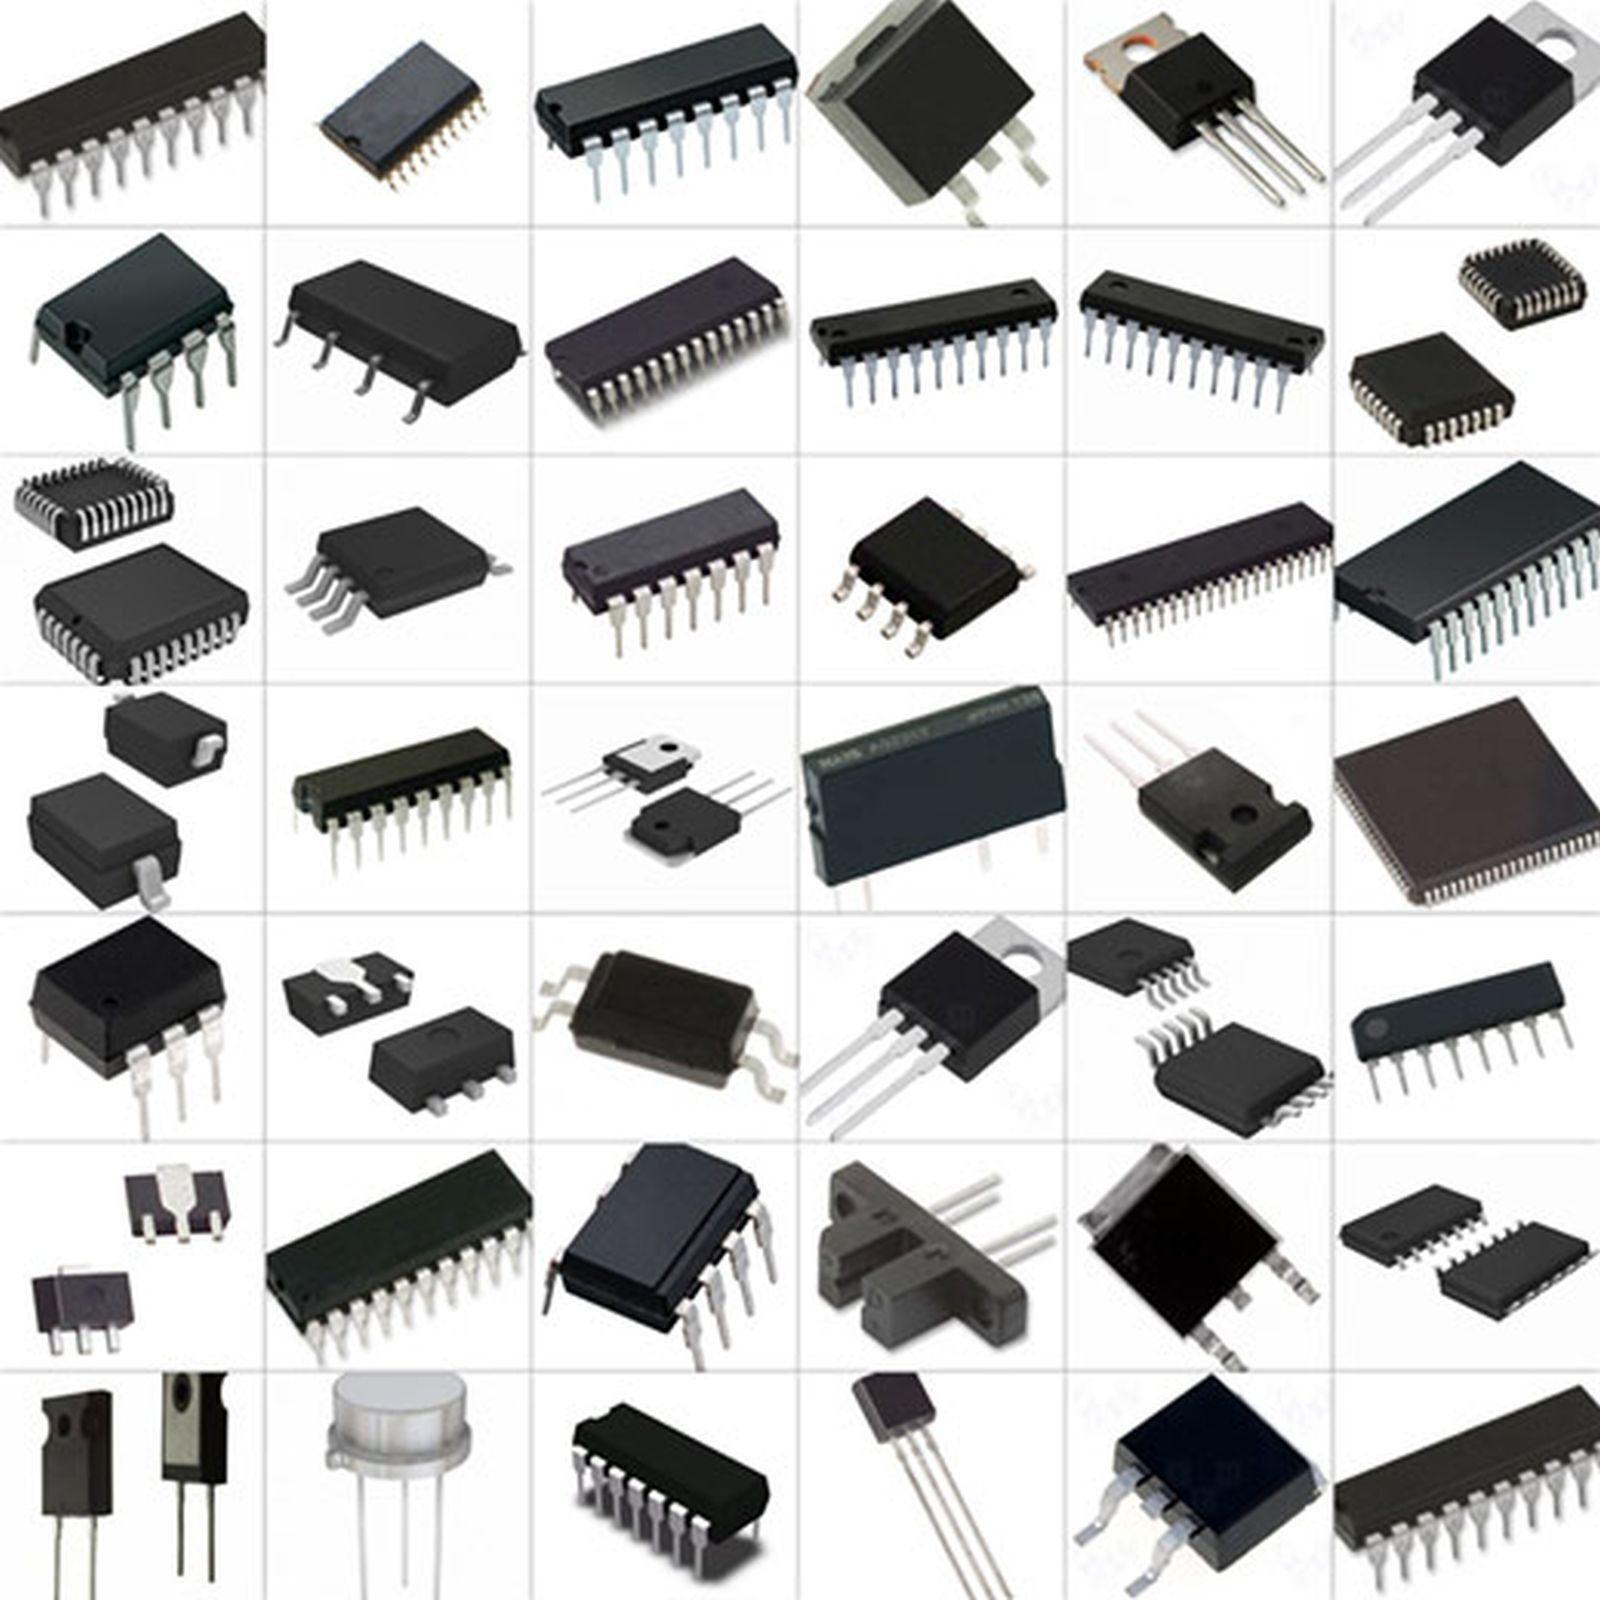 Standard MAKE BA5948FP Integrated Circuit CASE Rohm